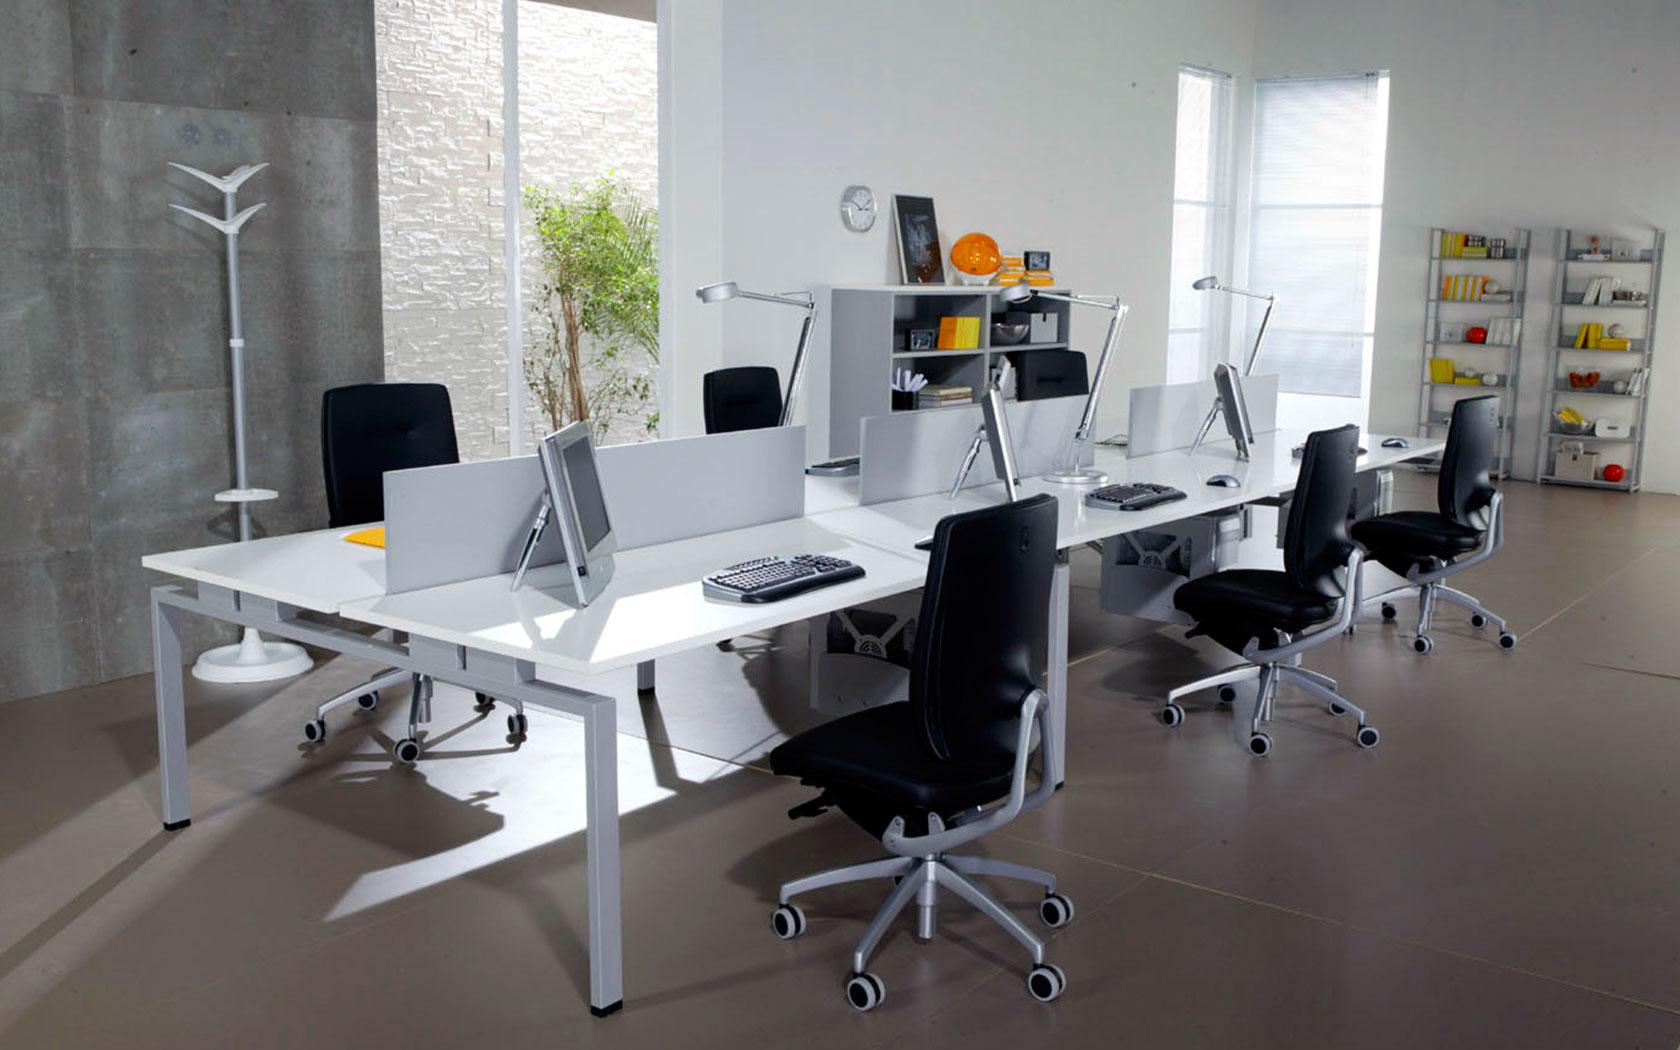 duodak despacho de arquitectos